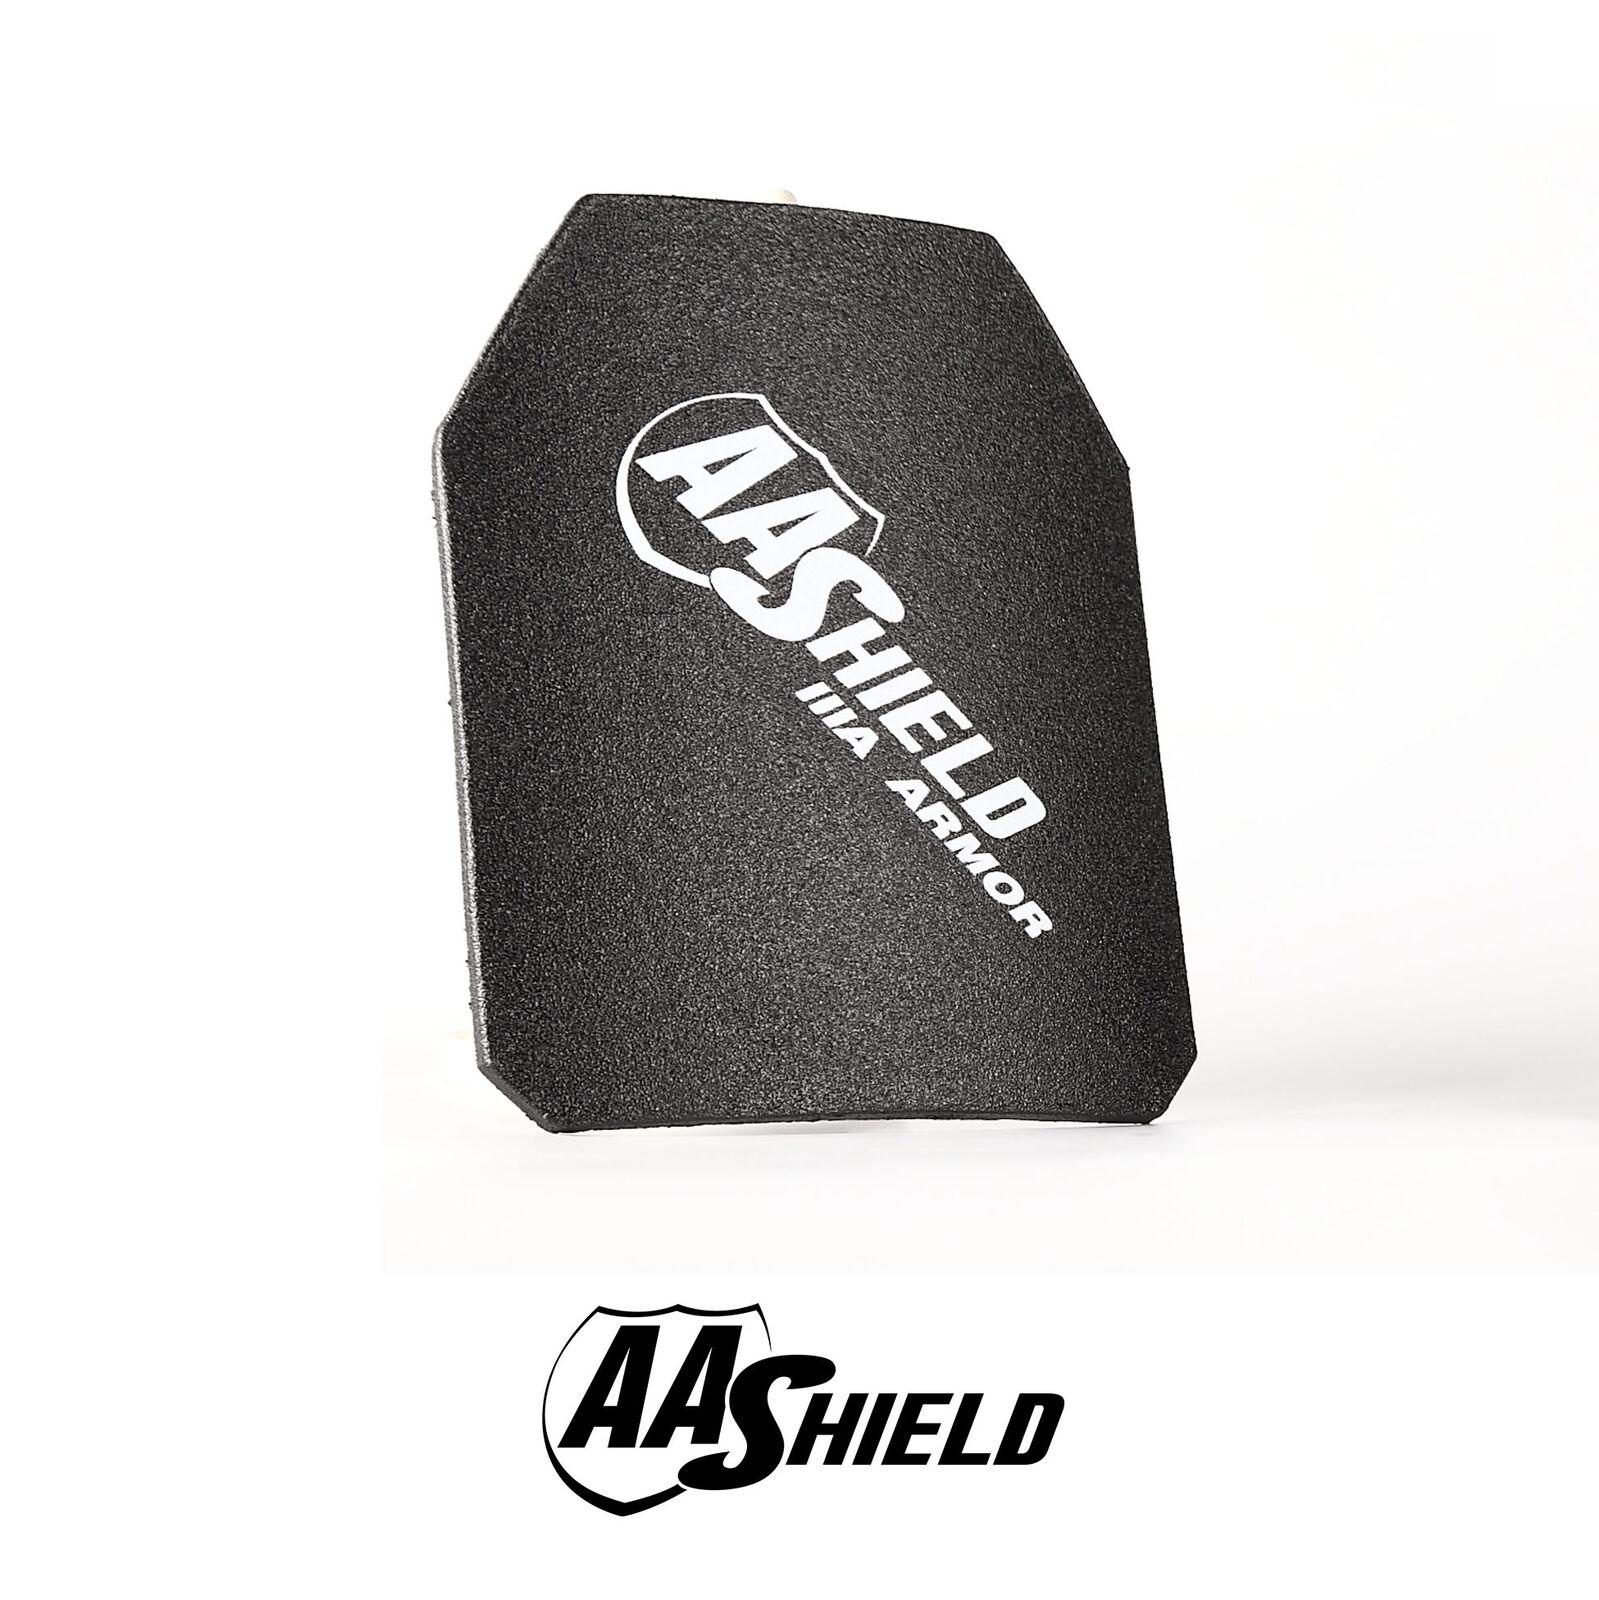 AA Shield Ballistic Light Weight Body Armor Hard Plate Lvl IIIA 3A 10x12 Cut